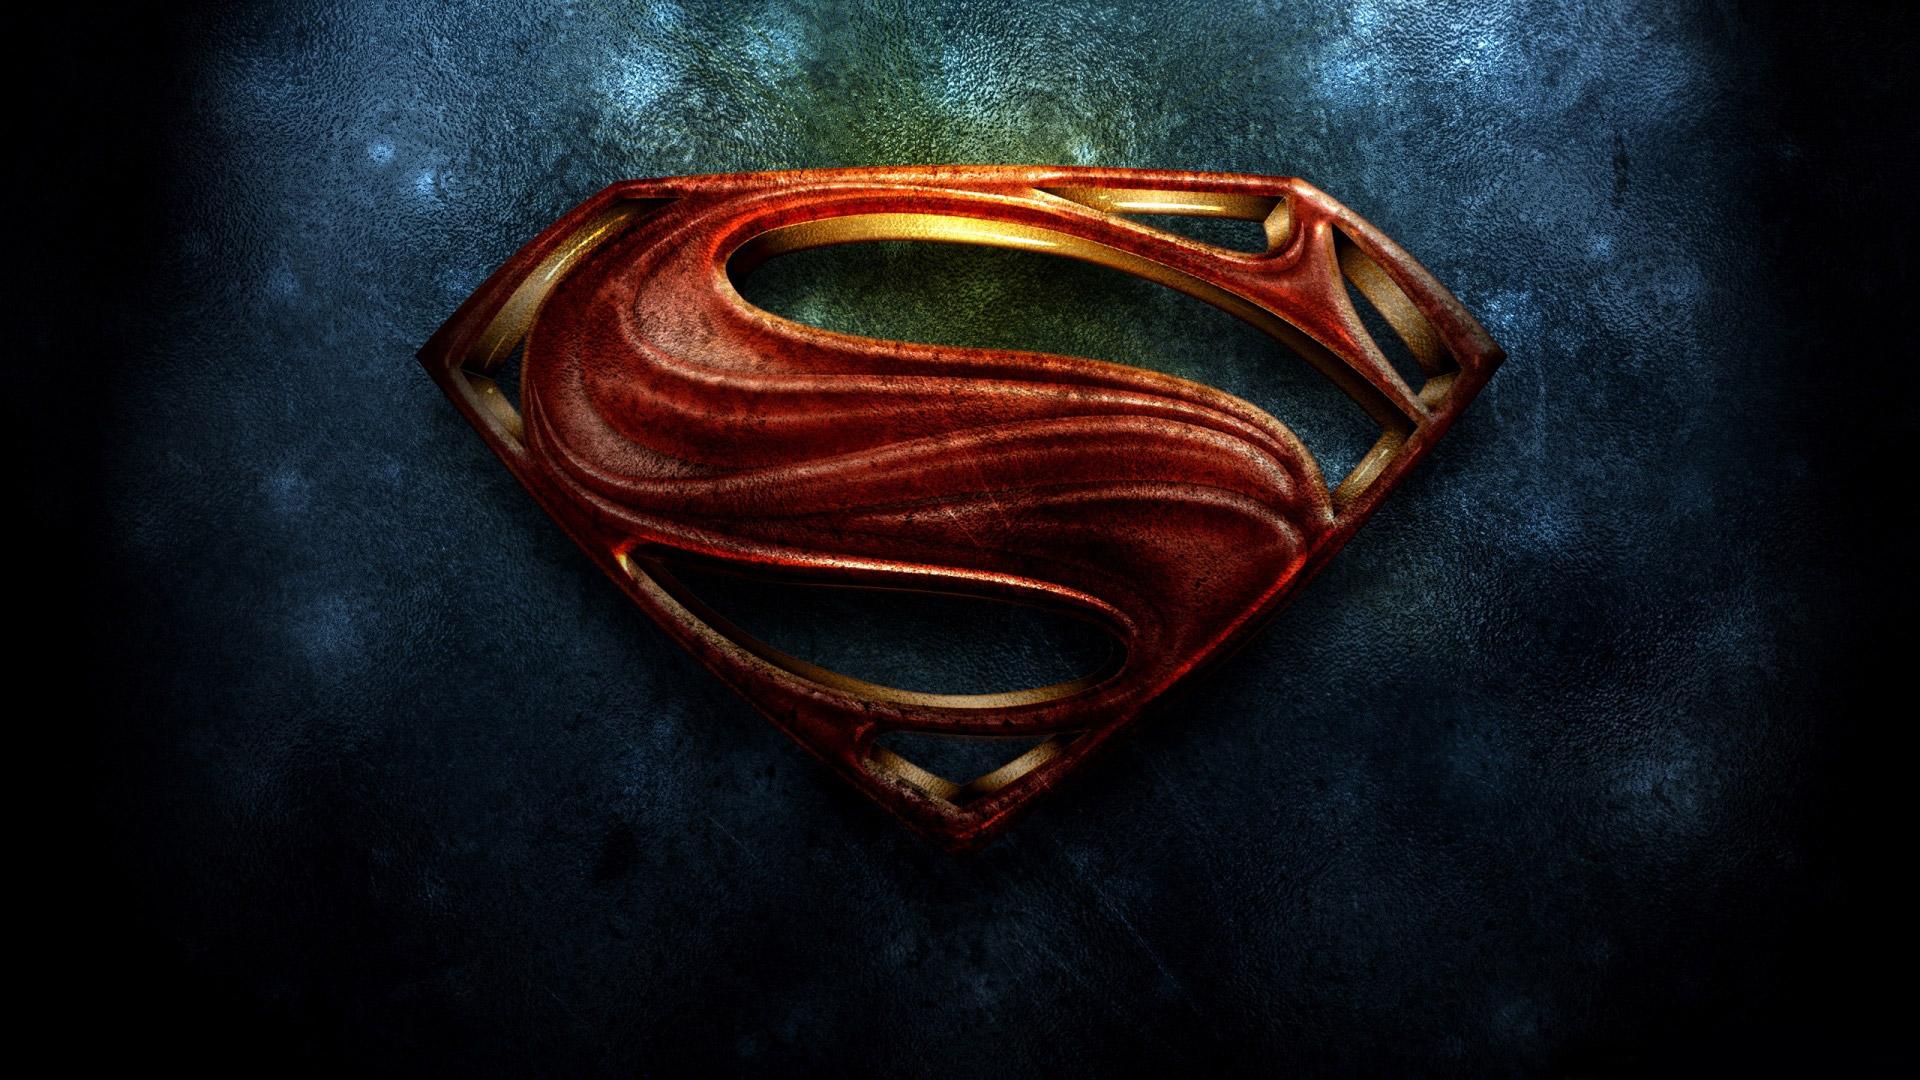 Superman The Man of Steel 2013 Logo HD Wallpaper 1920x1080